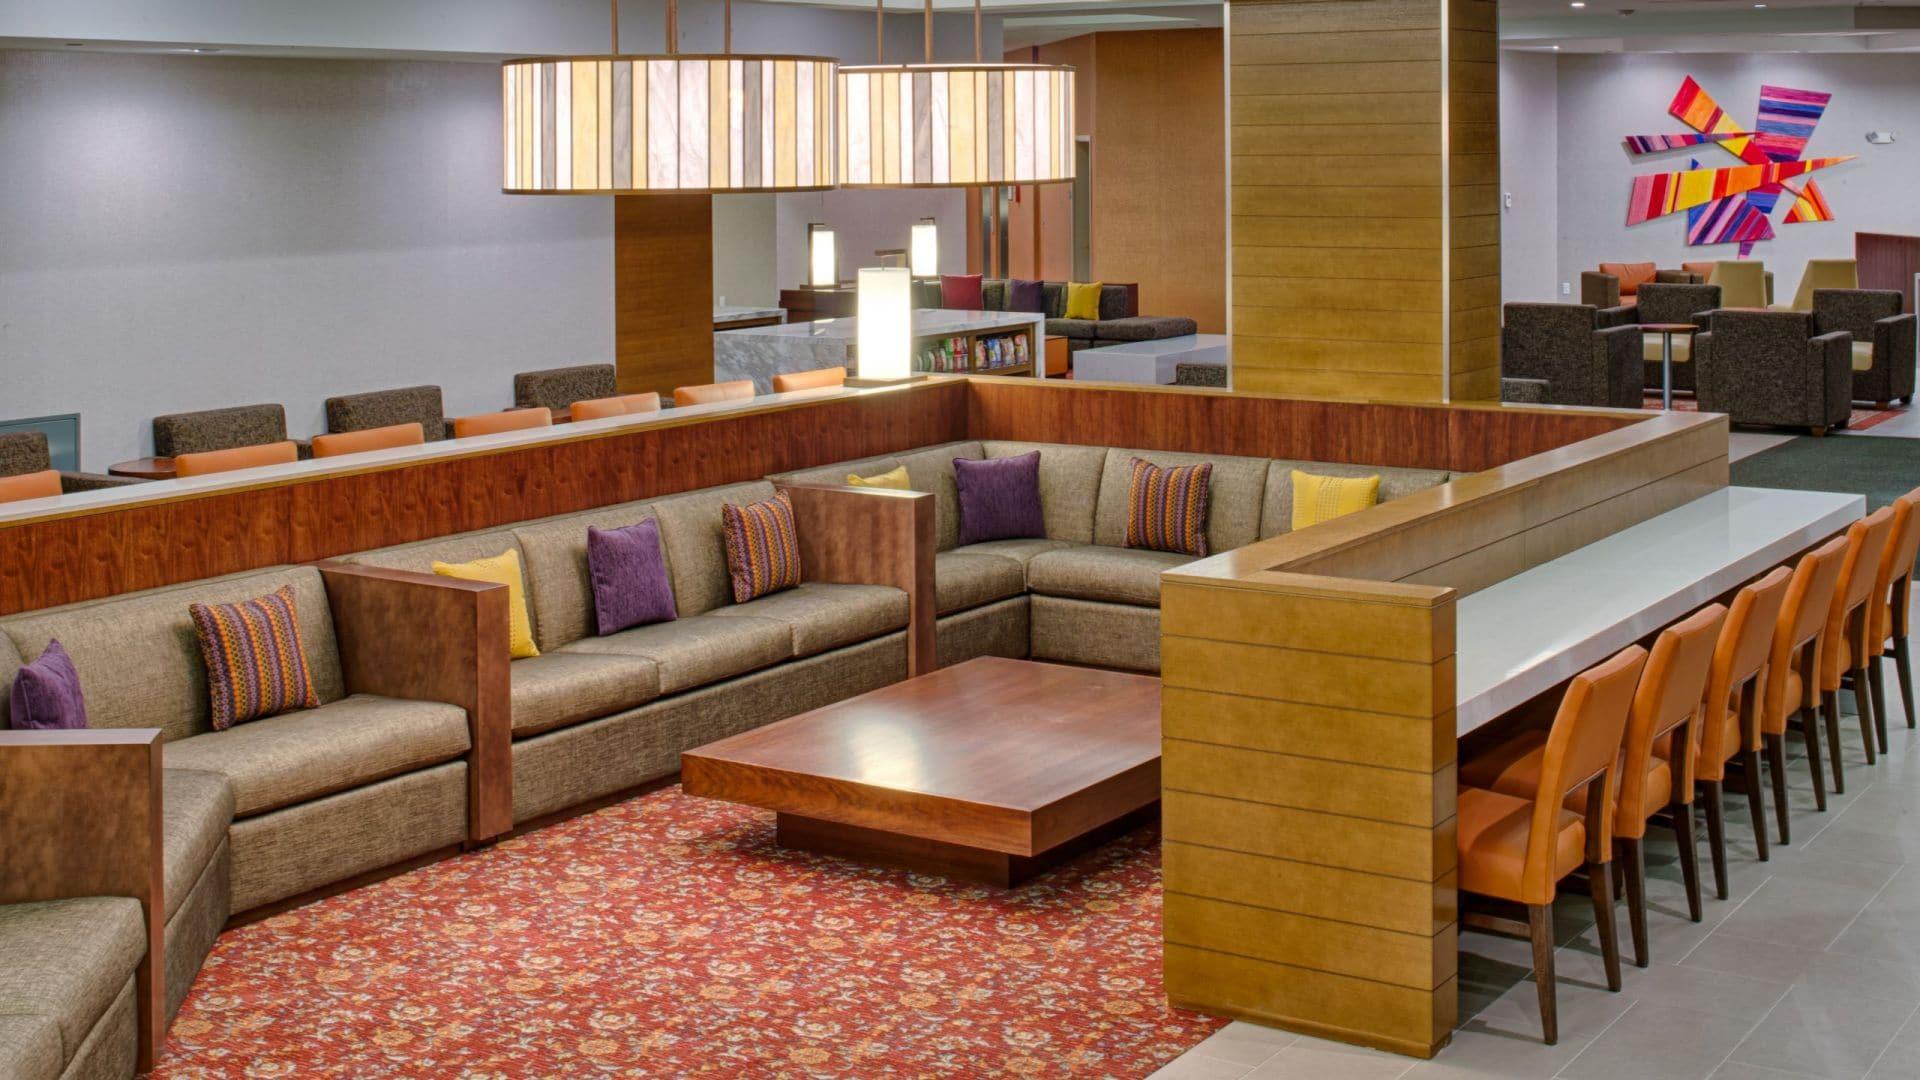 Hyatt House Seattle Downtown lobby seating